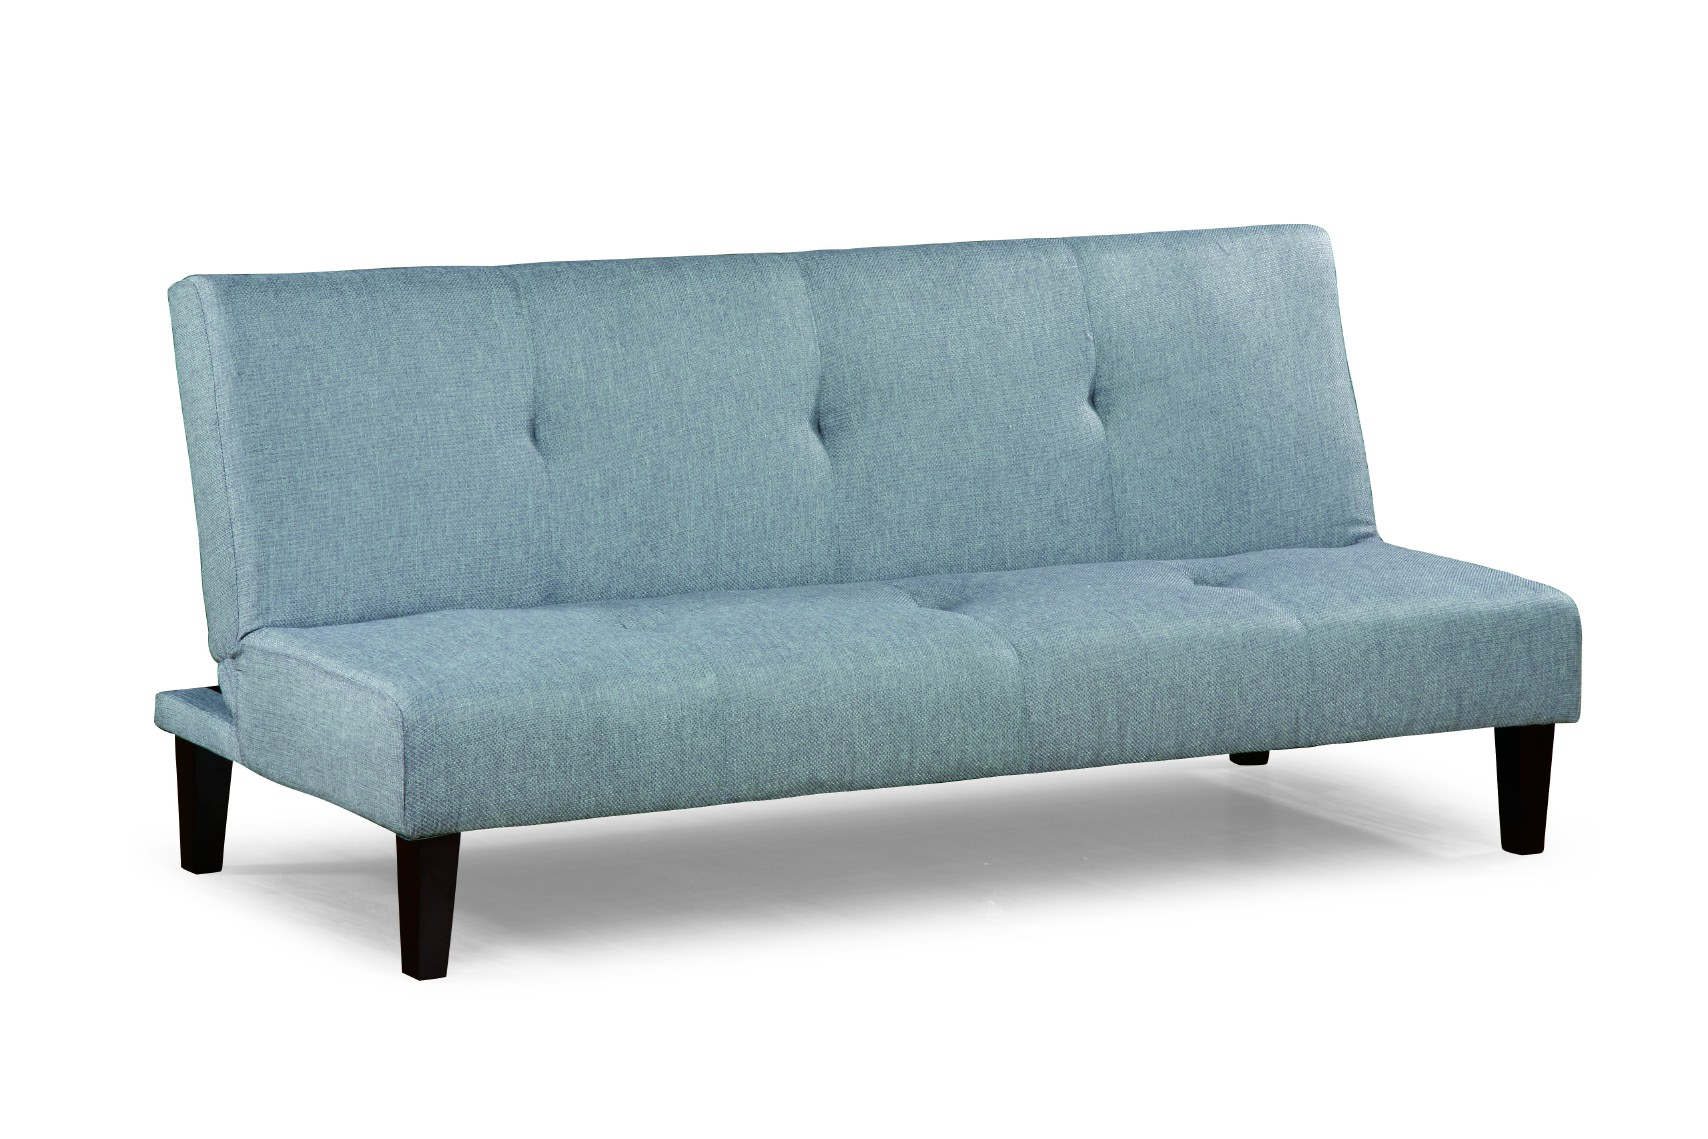 Cheap Sofa Bed Futon Furniture